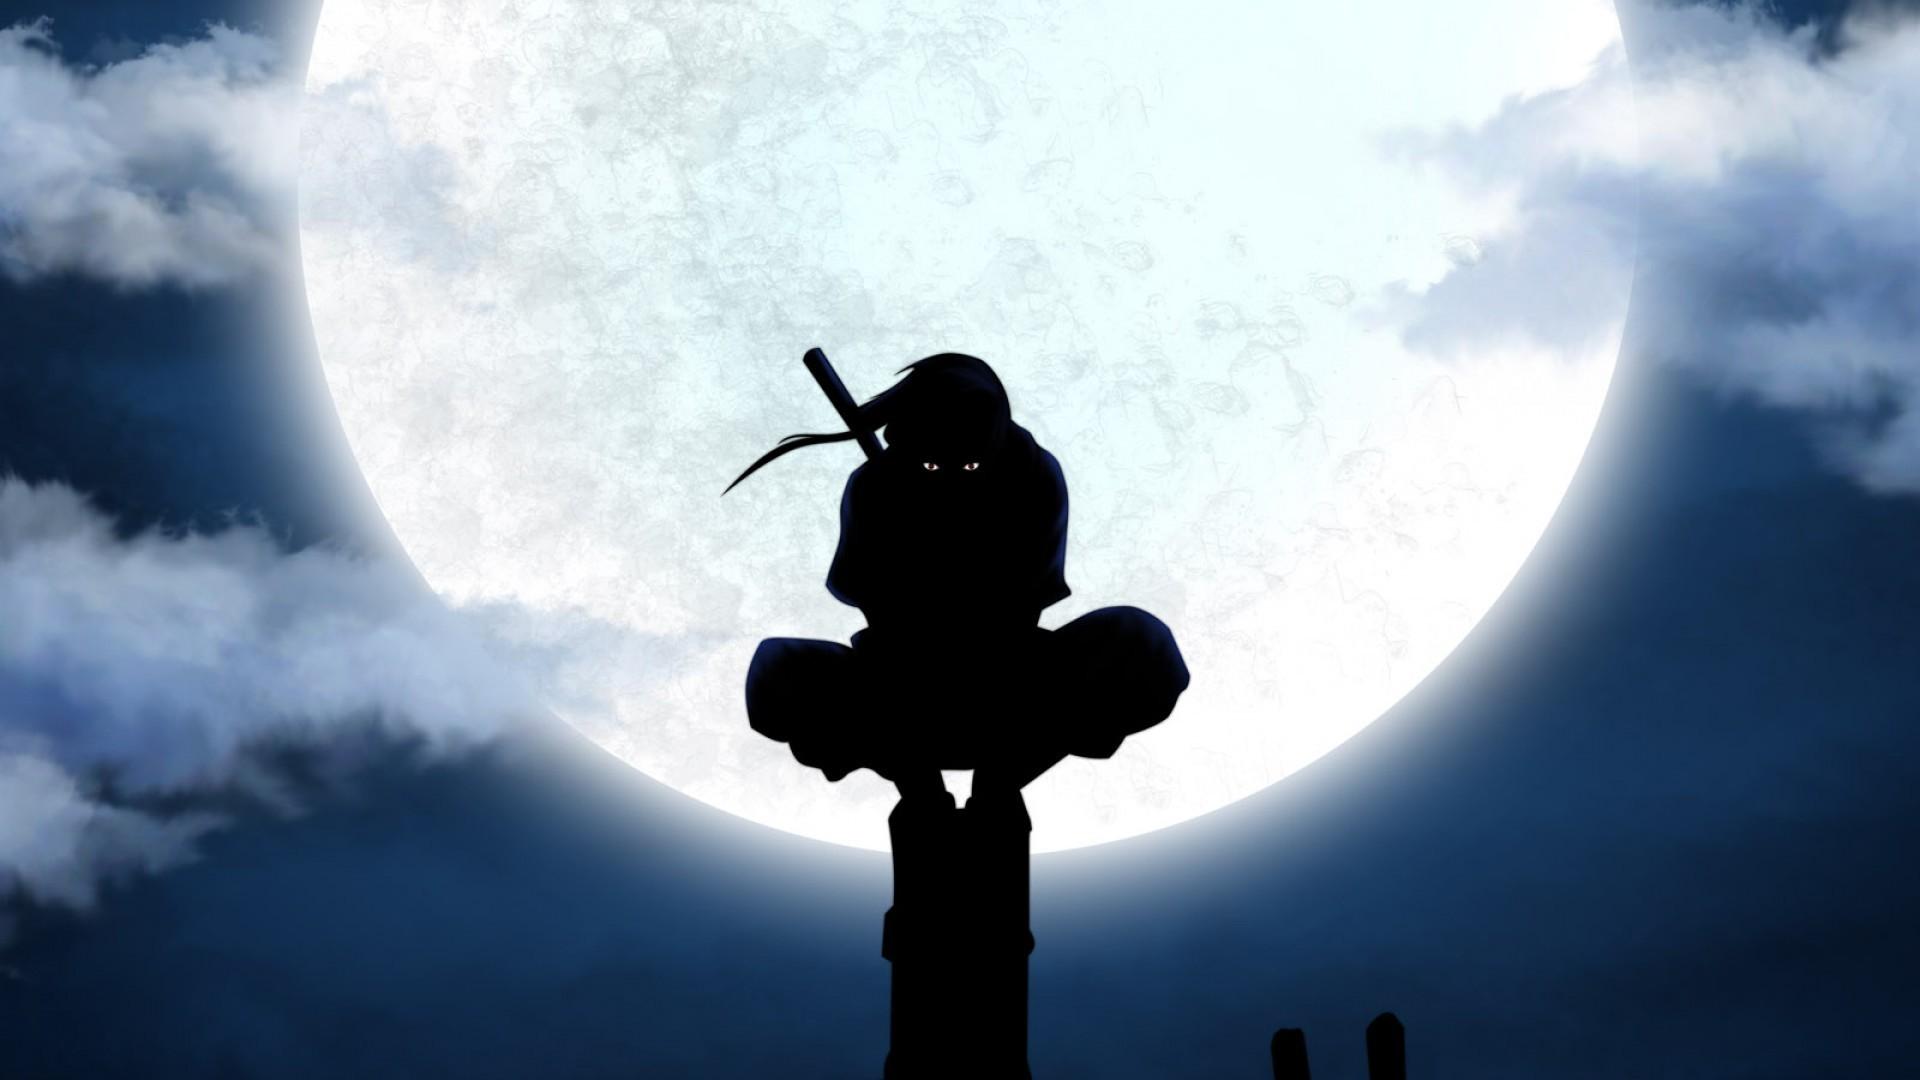 uchiha itachi moon silhouette anbu anime utility pole